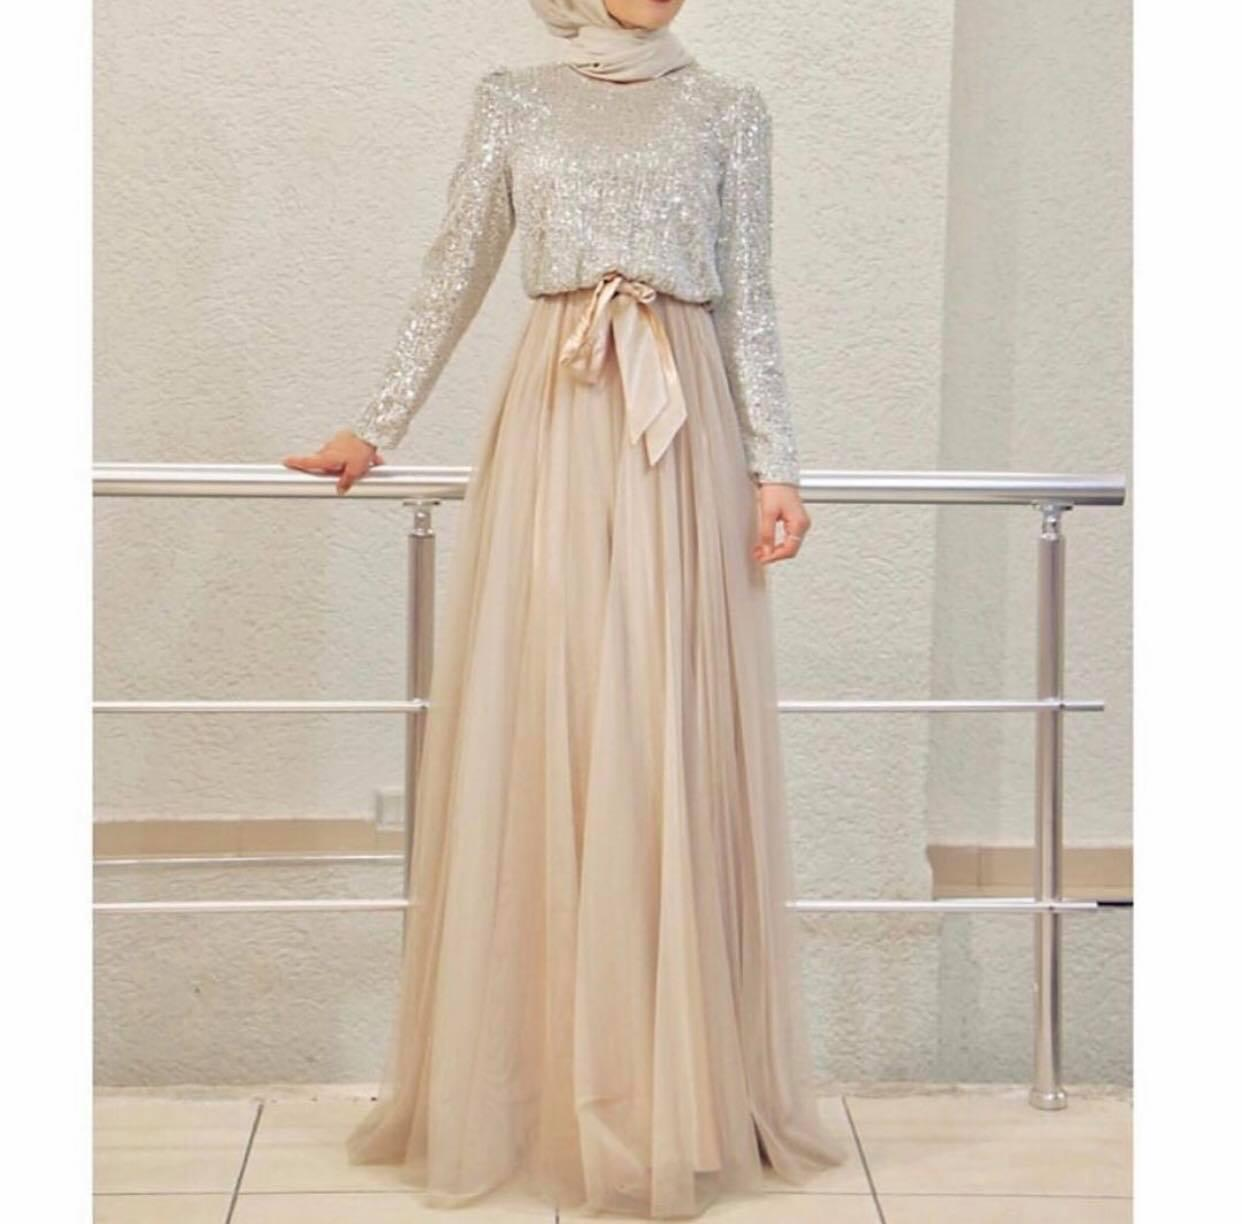 68a3a29444 shirt with skirt fancy